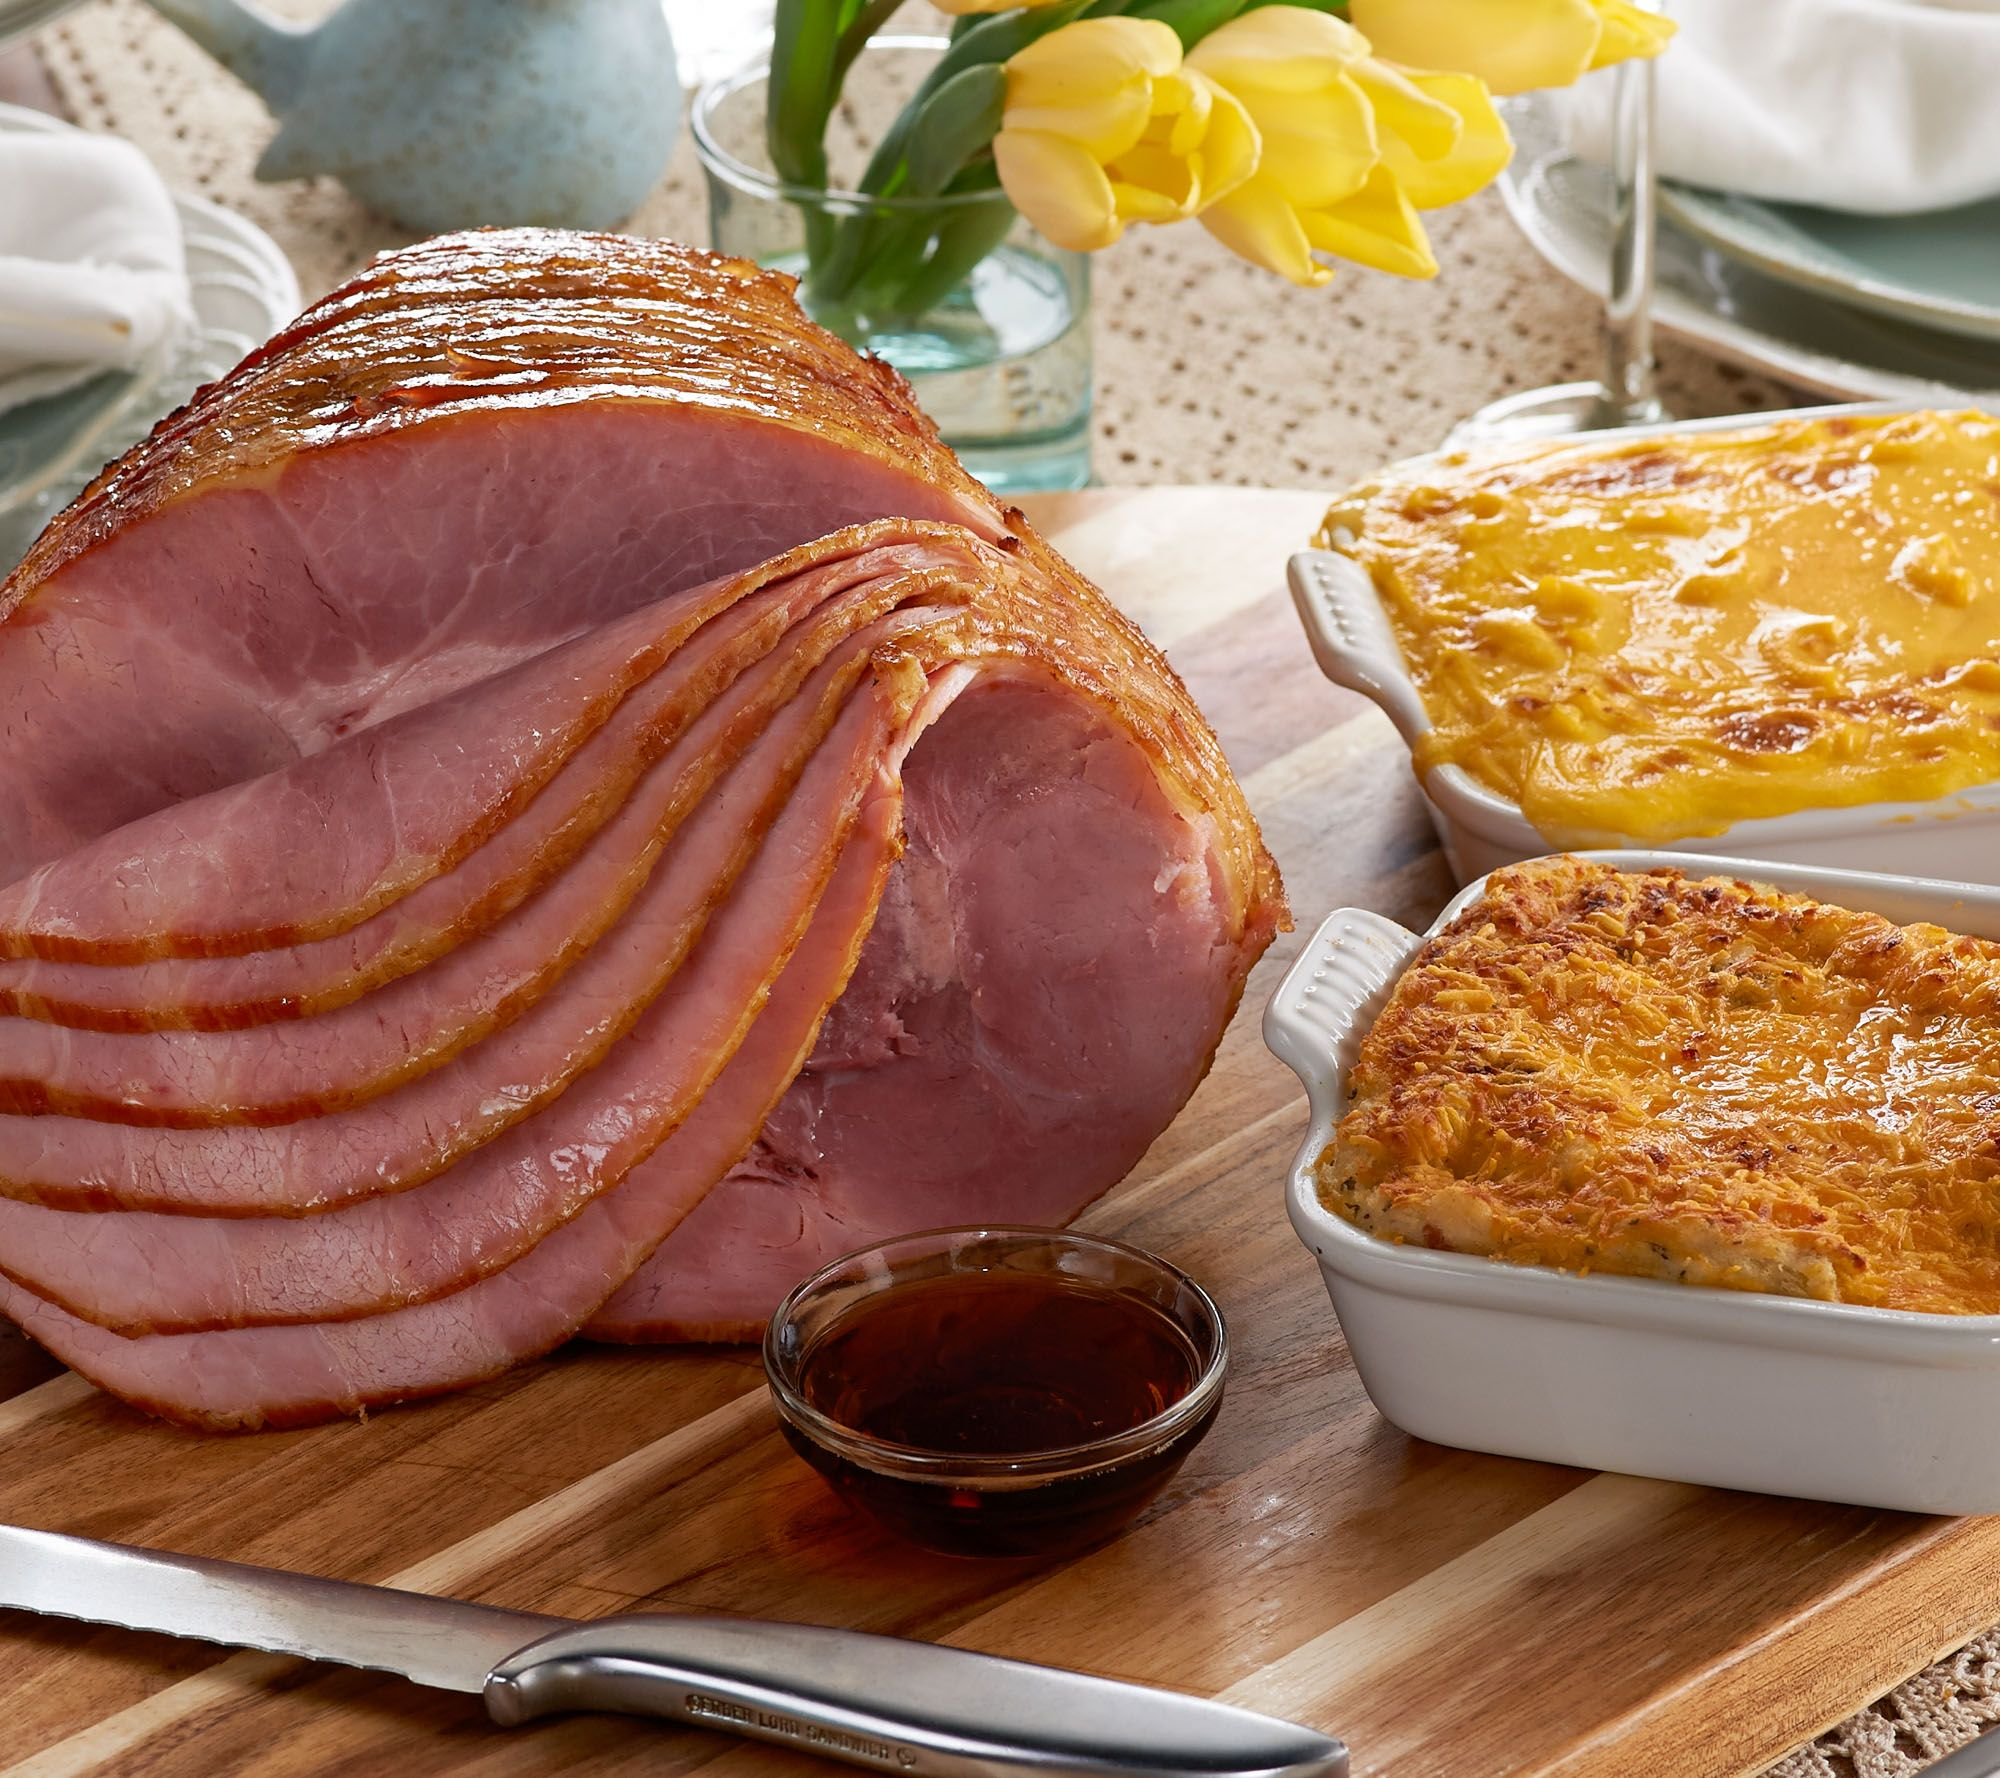 Blue apron bayonne - Kansas City 7 25 8 5lb Ham With 2 2 Lb St